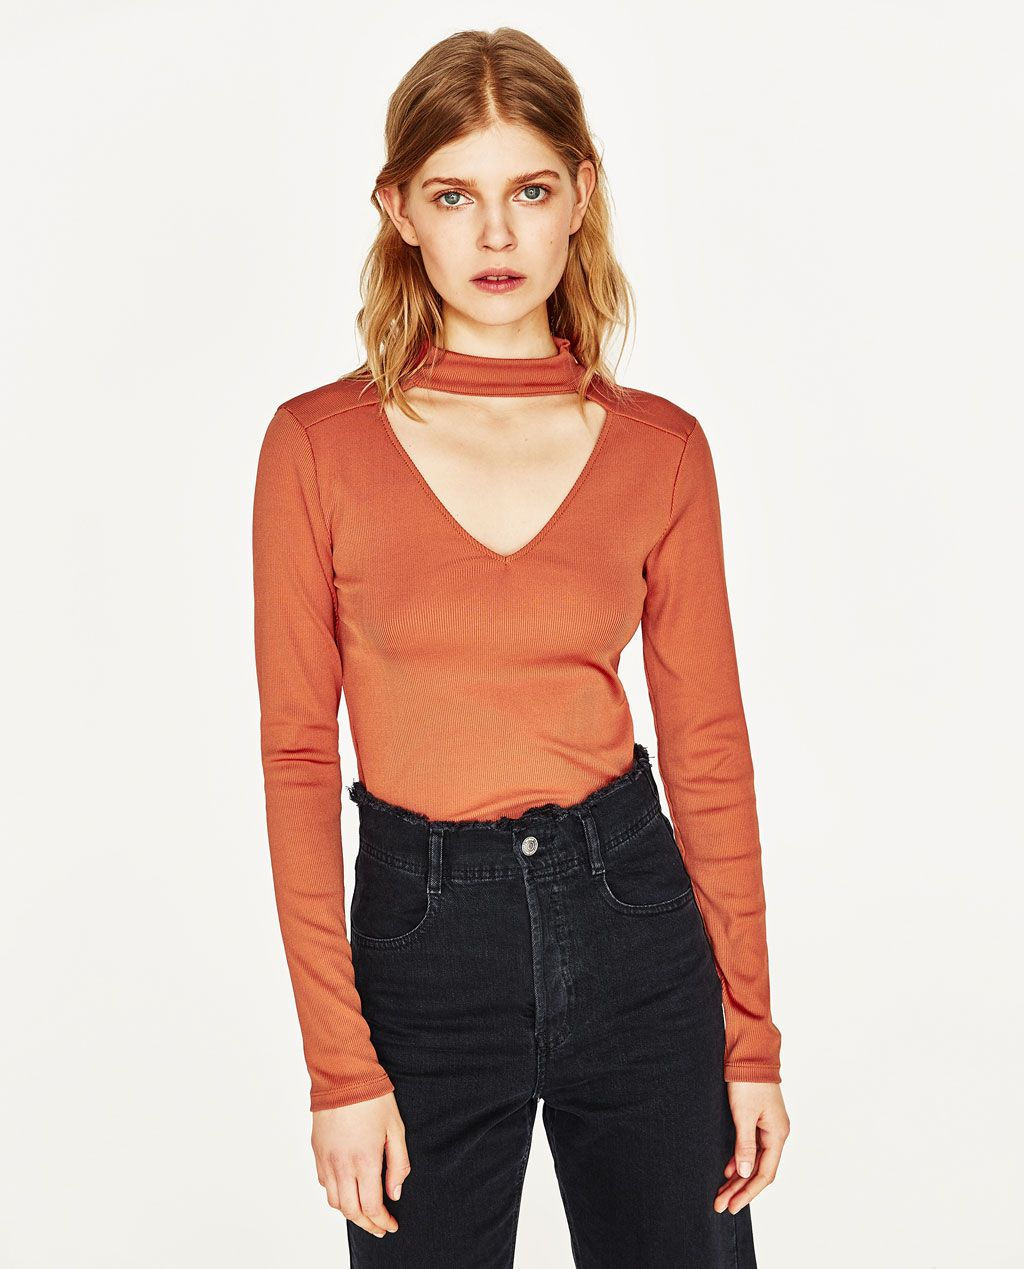 Zara black t shirt india - Image 2 Of Choker Neck T Shirt From Zara